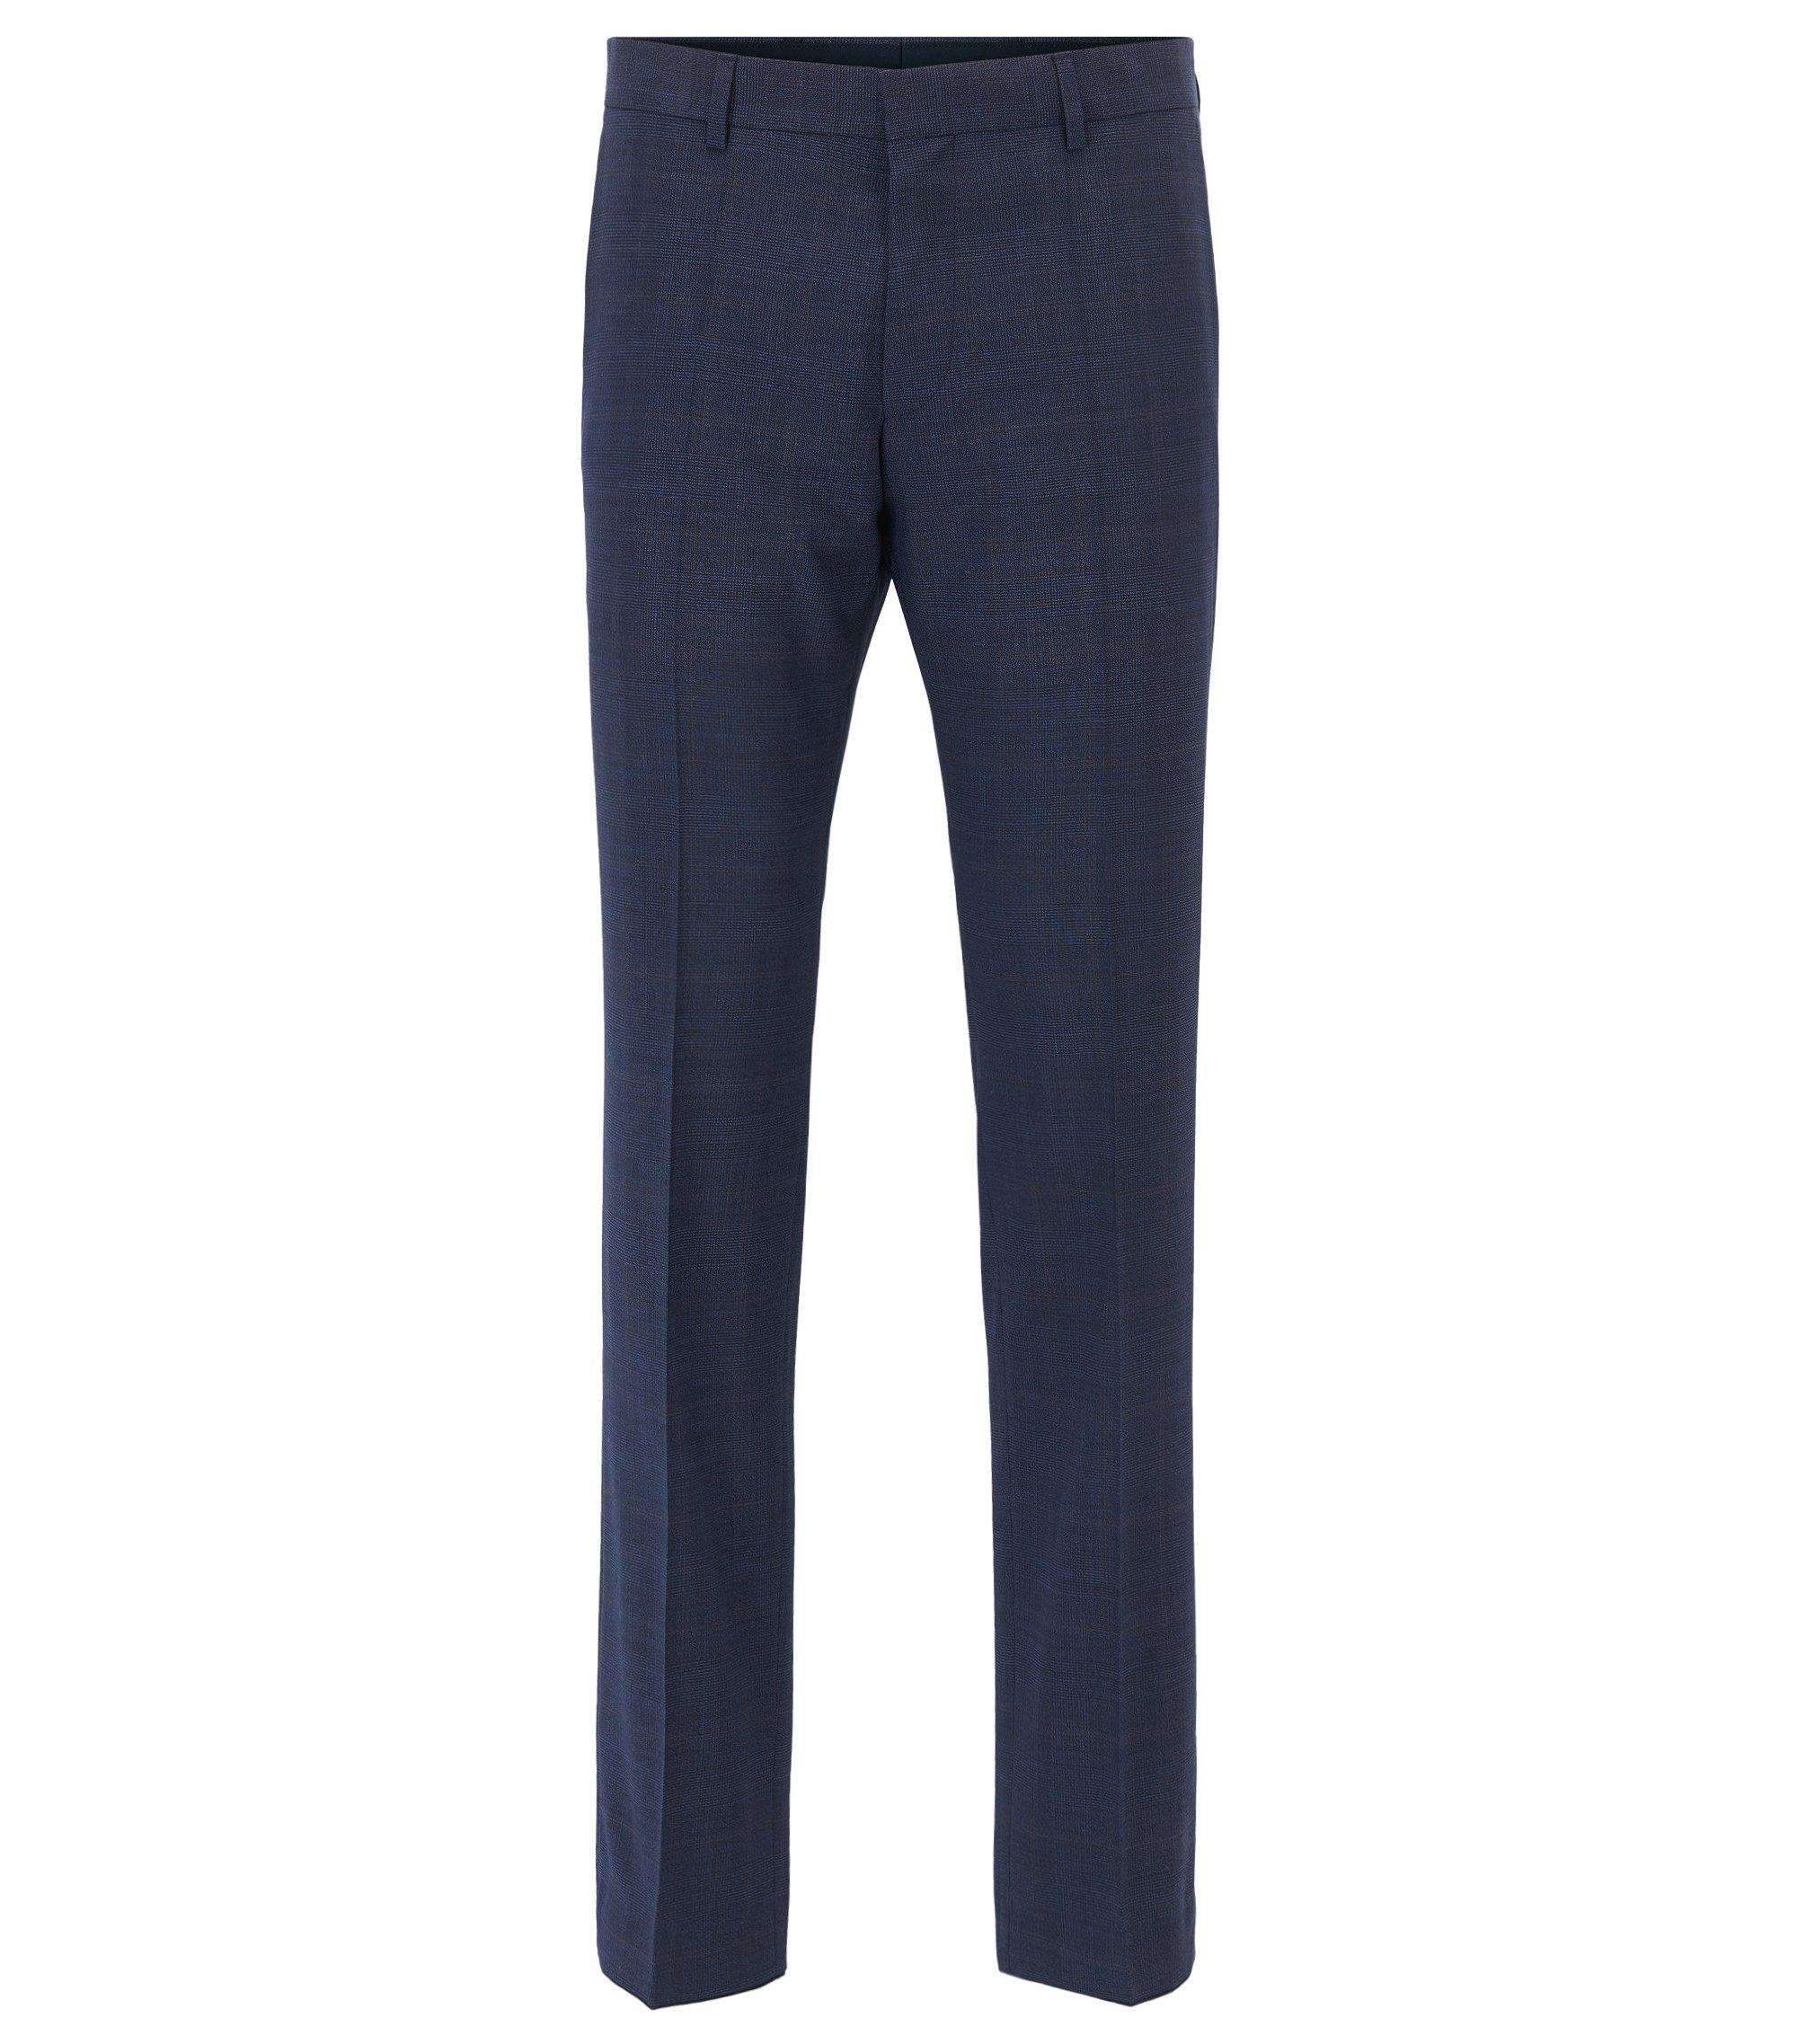 Pantalones a cuadros slim fit en lana virgen, Azul oscuro